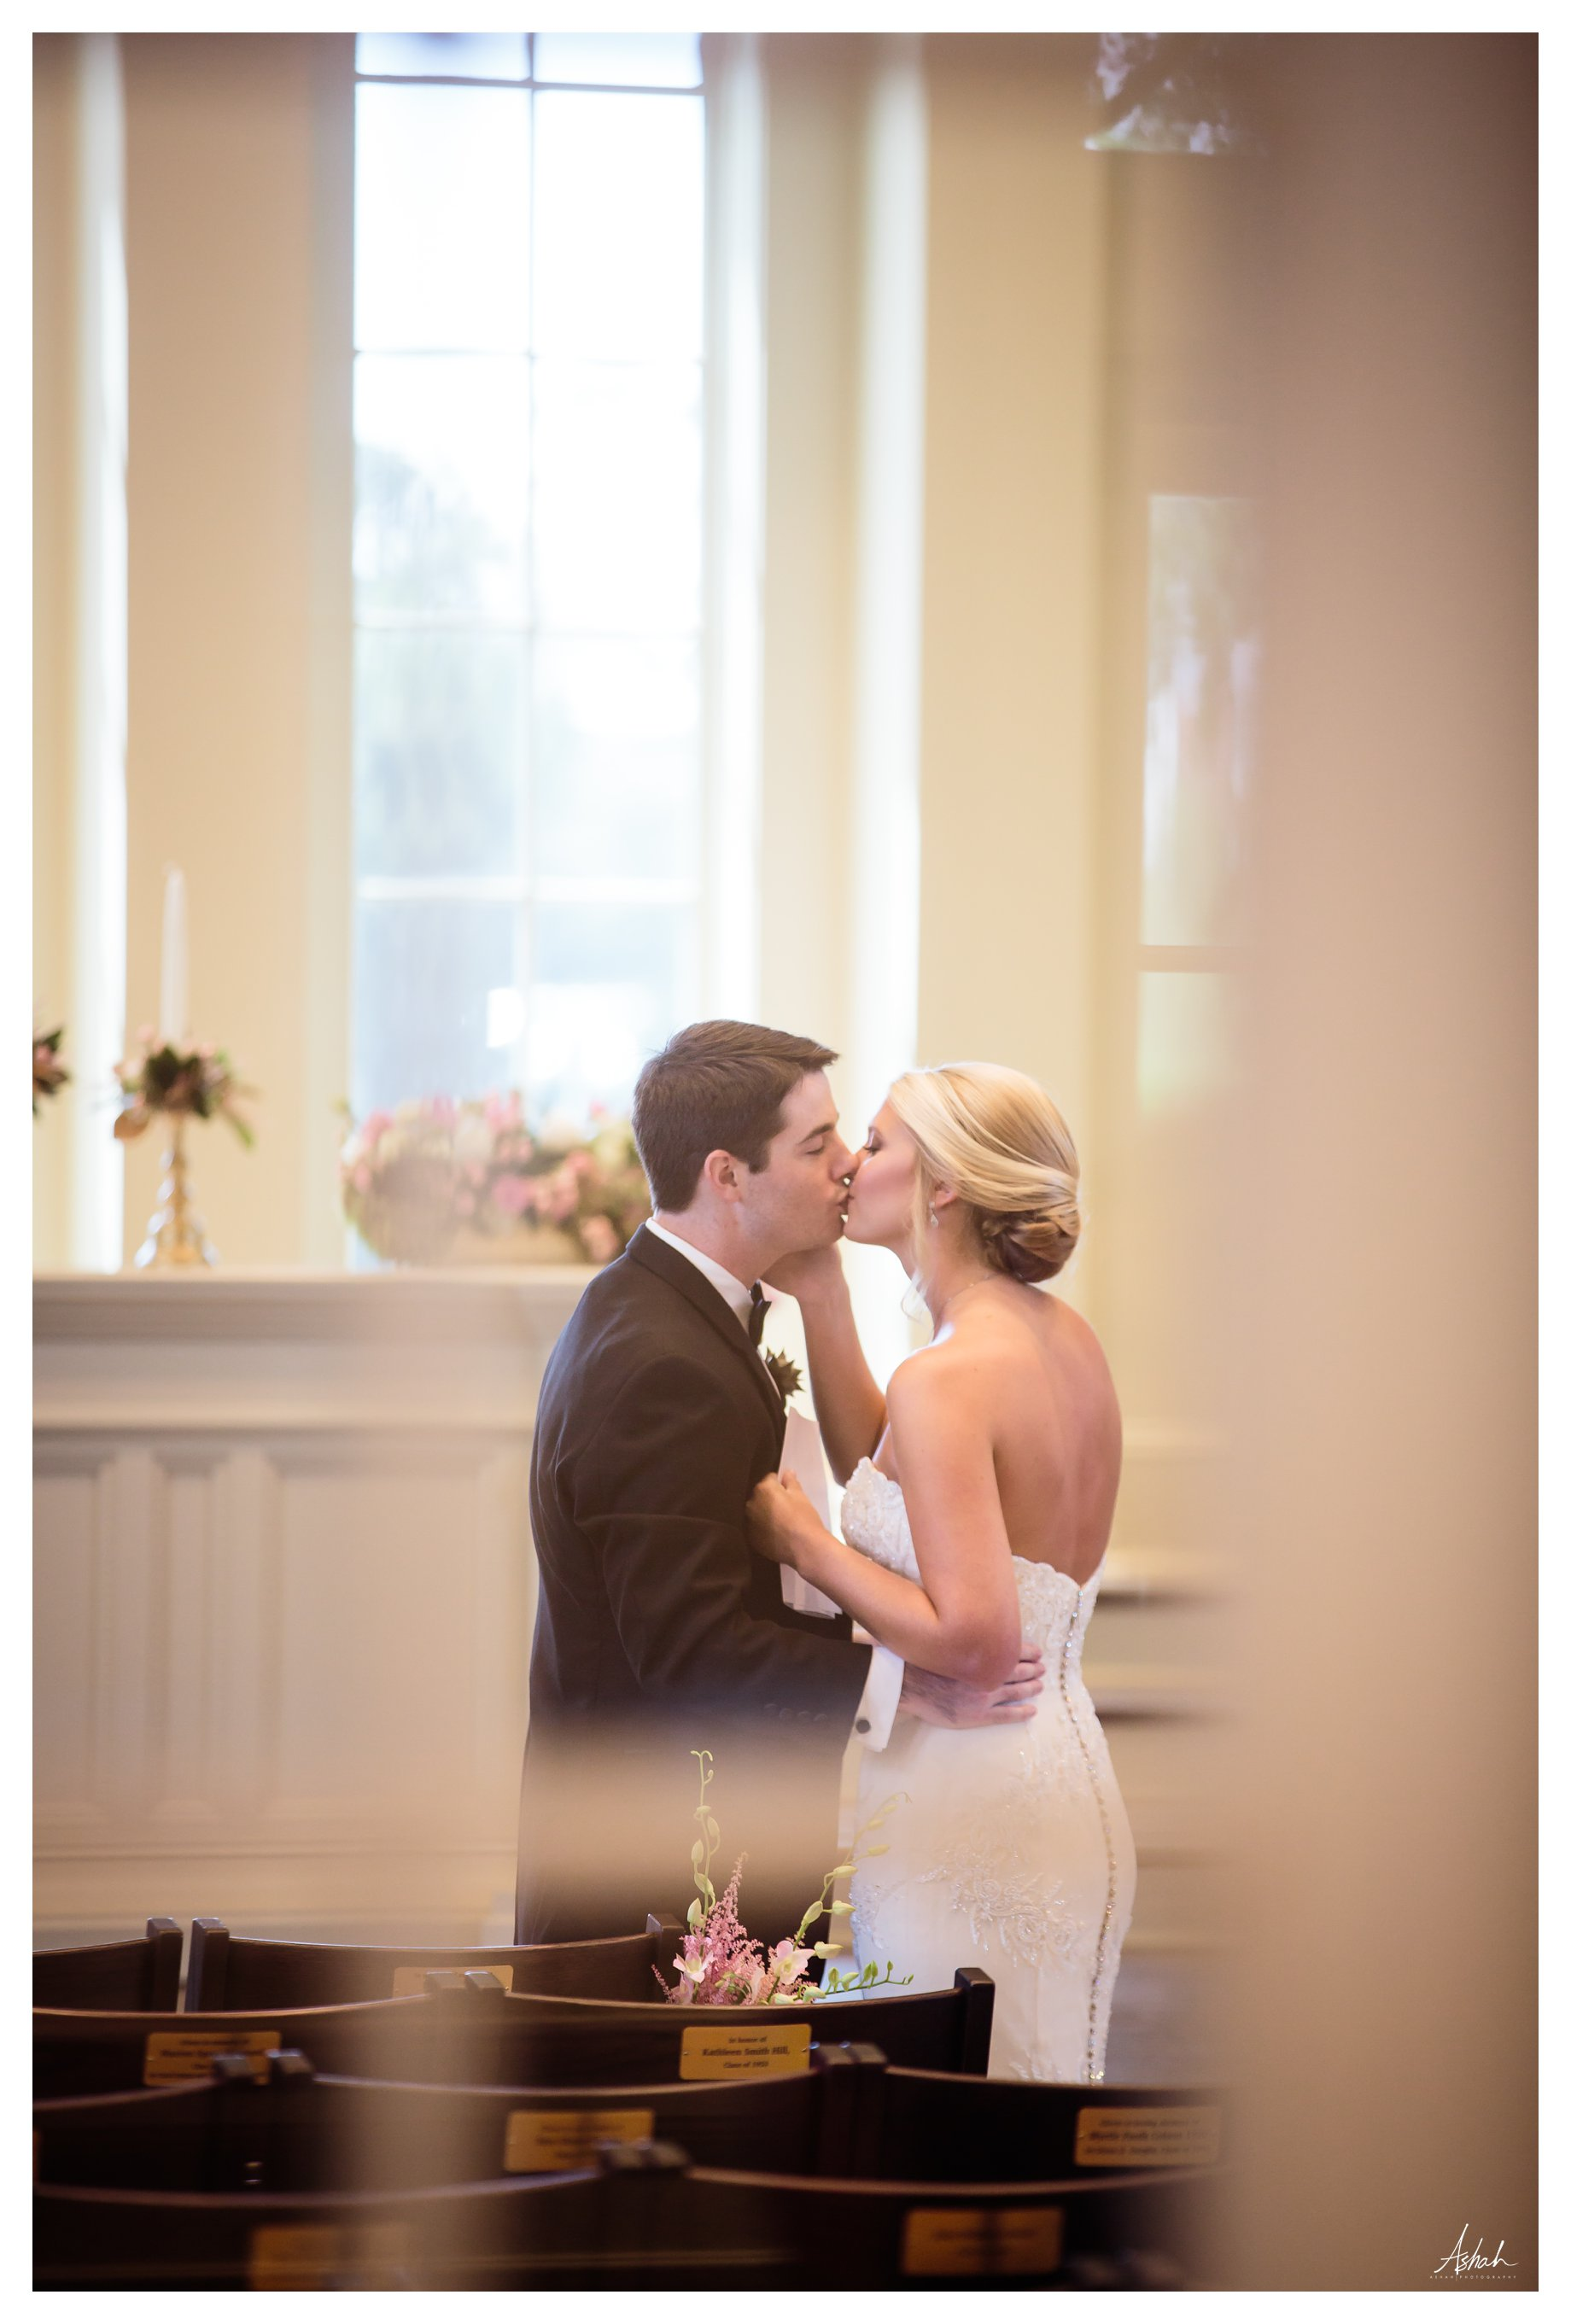 Sneaking a Kiss -- Macon Wedding Photographer